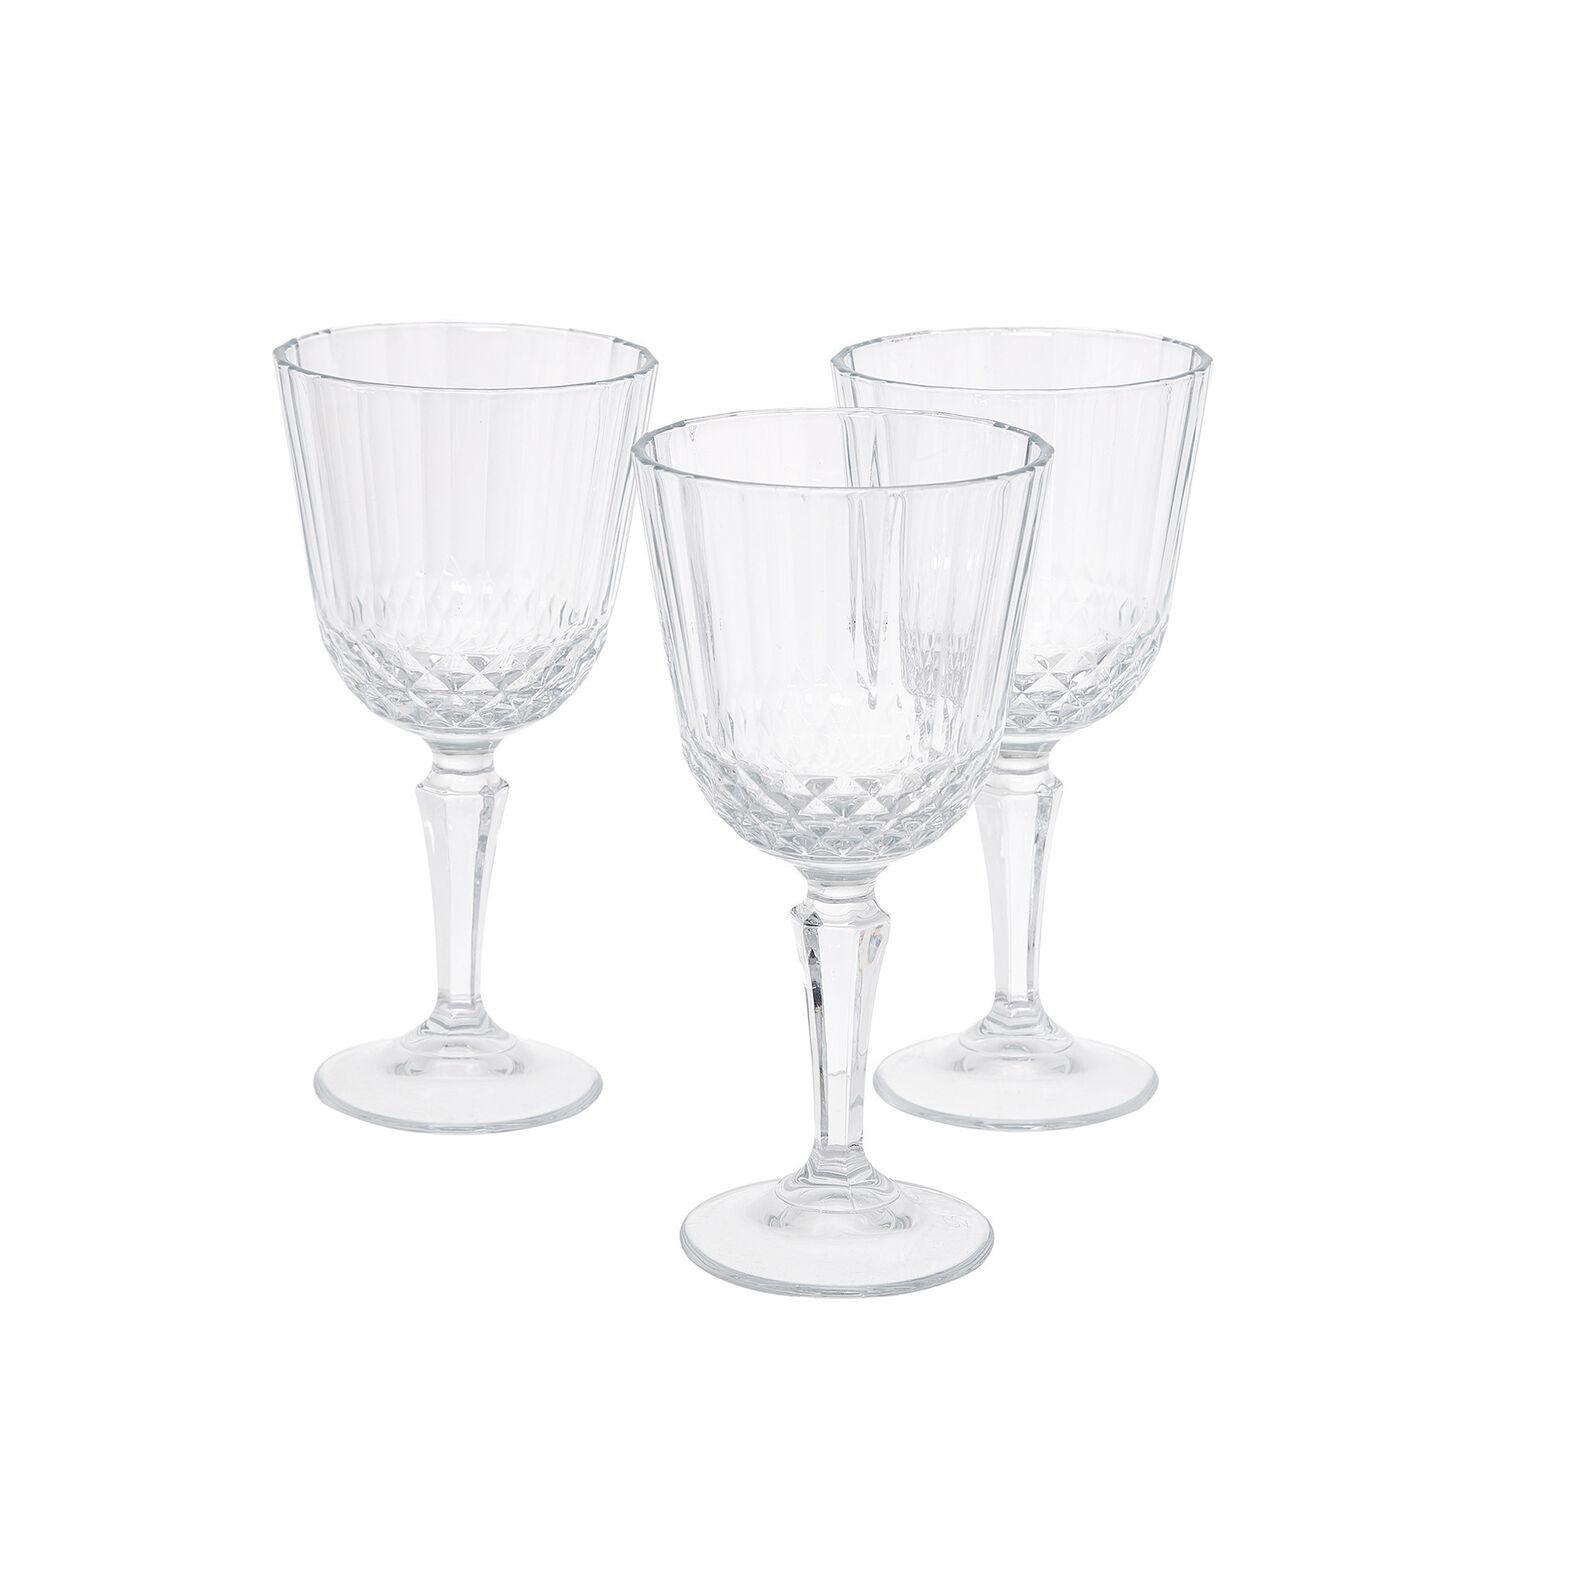 Set of 3 glass Diony wine goblets